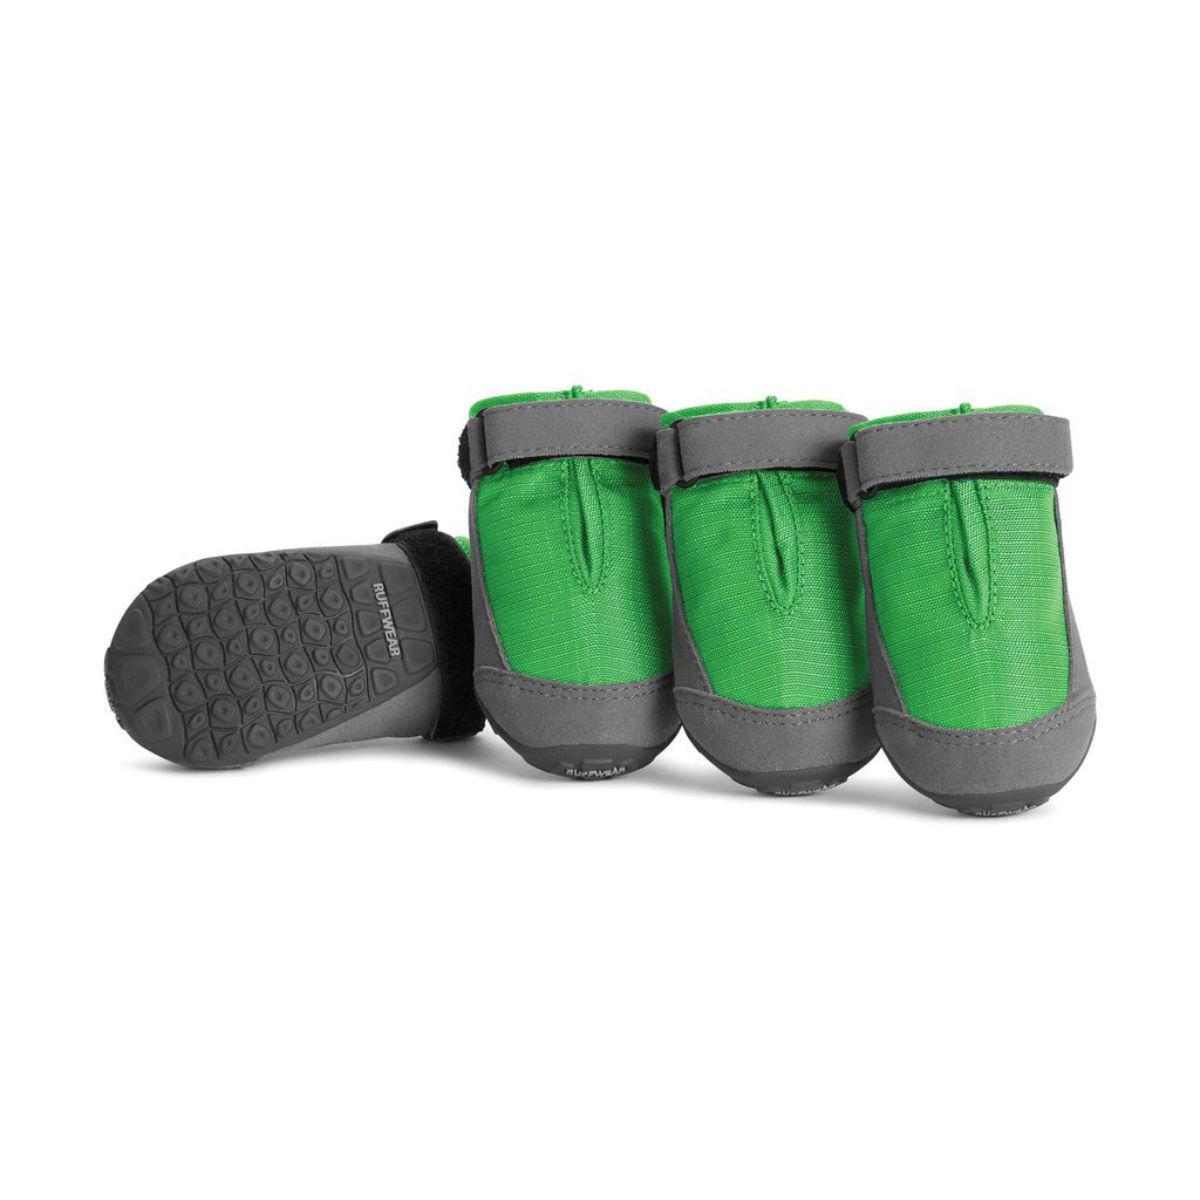 Summit Trex Dog Boots by Ruffwear - 4 Pack - Meadow Green